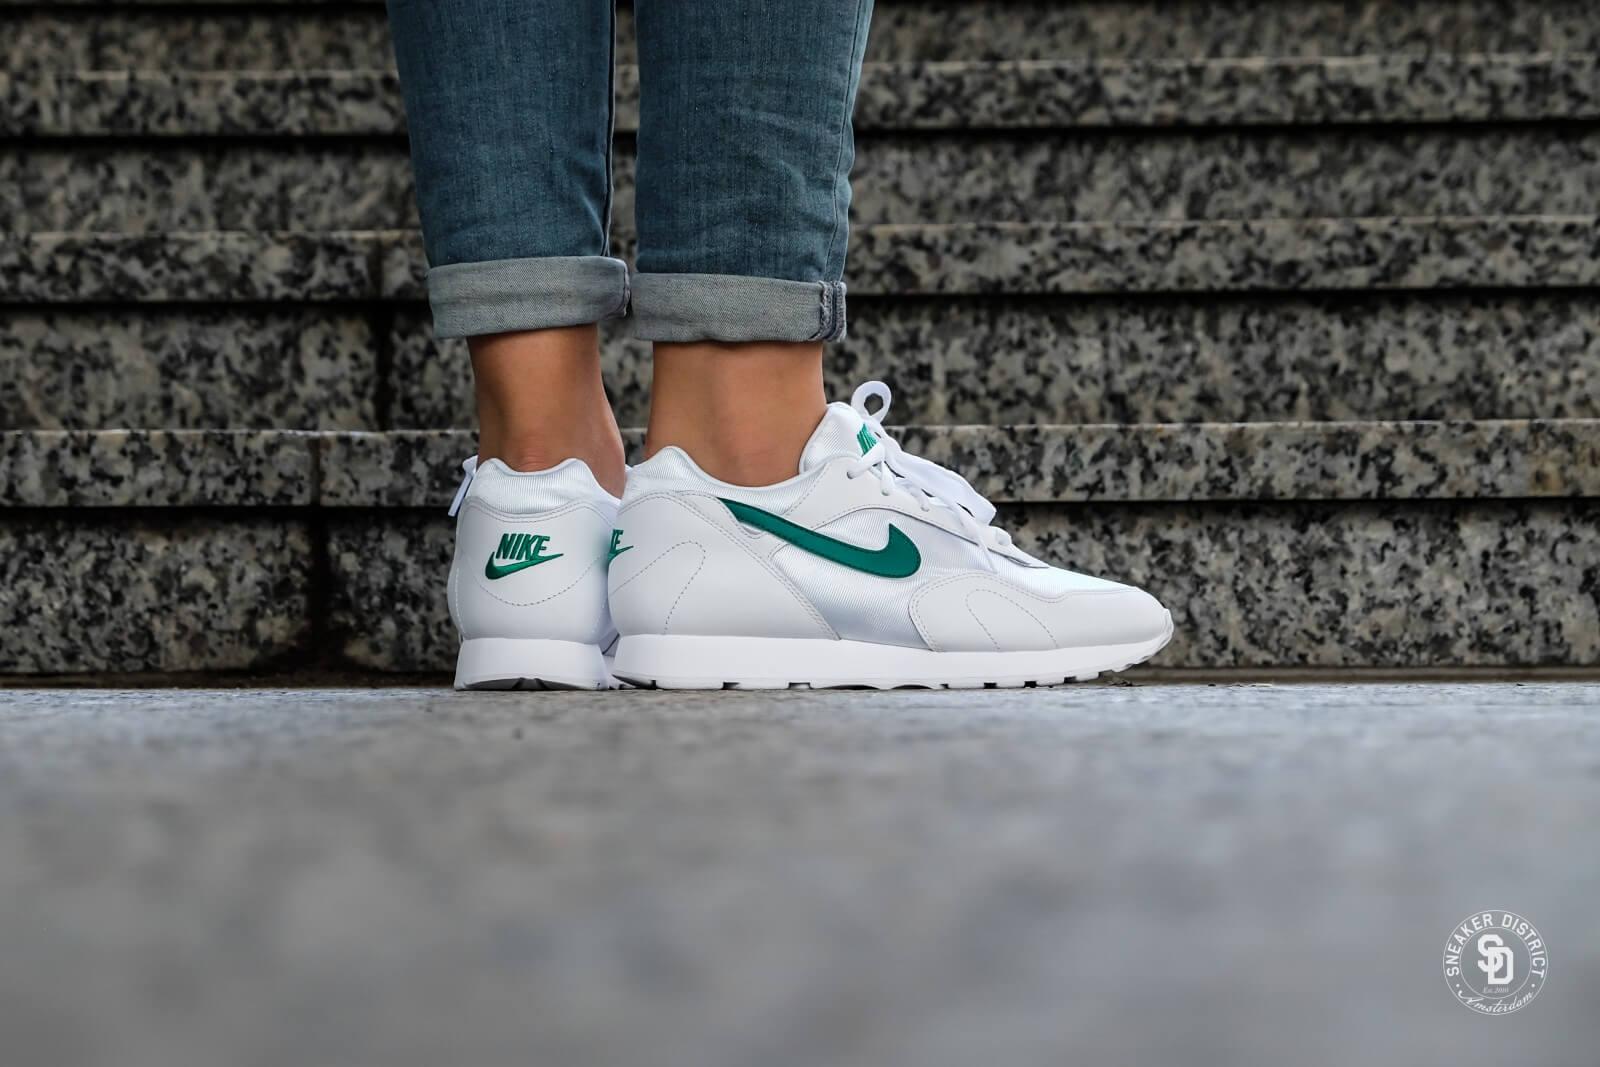 Nike Women's Outburst White/Opal Green